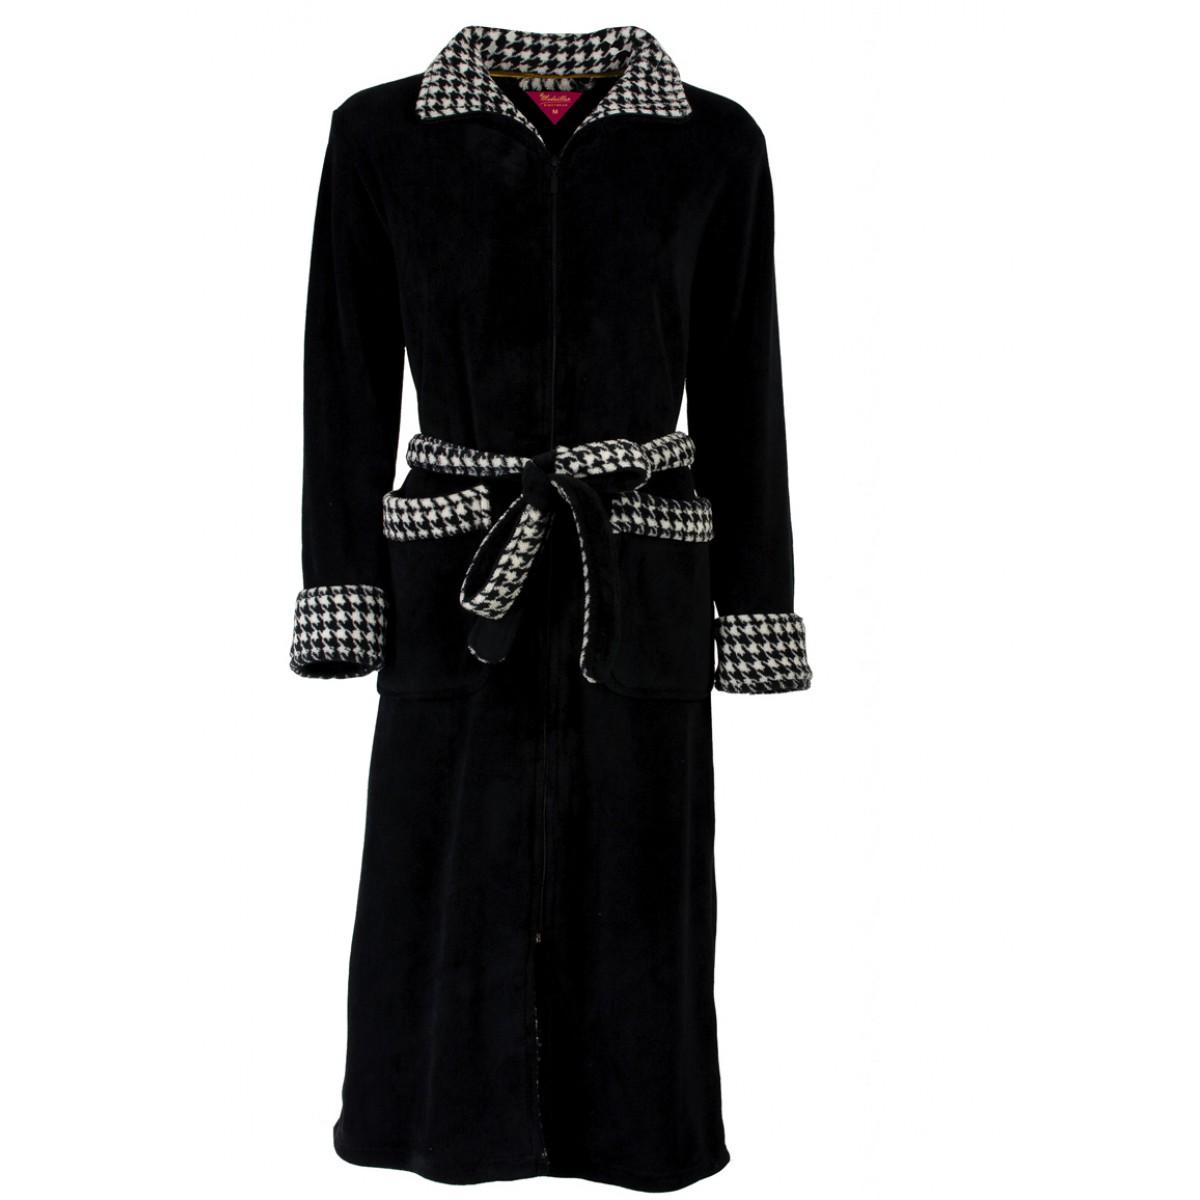 zwarte badjas met rits